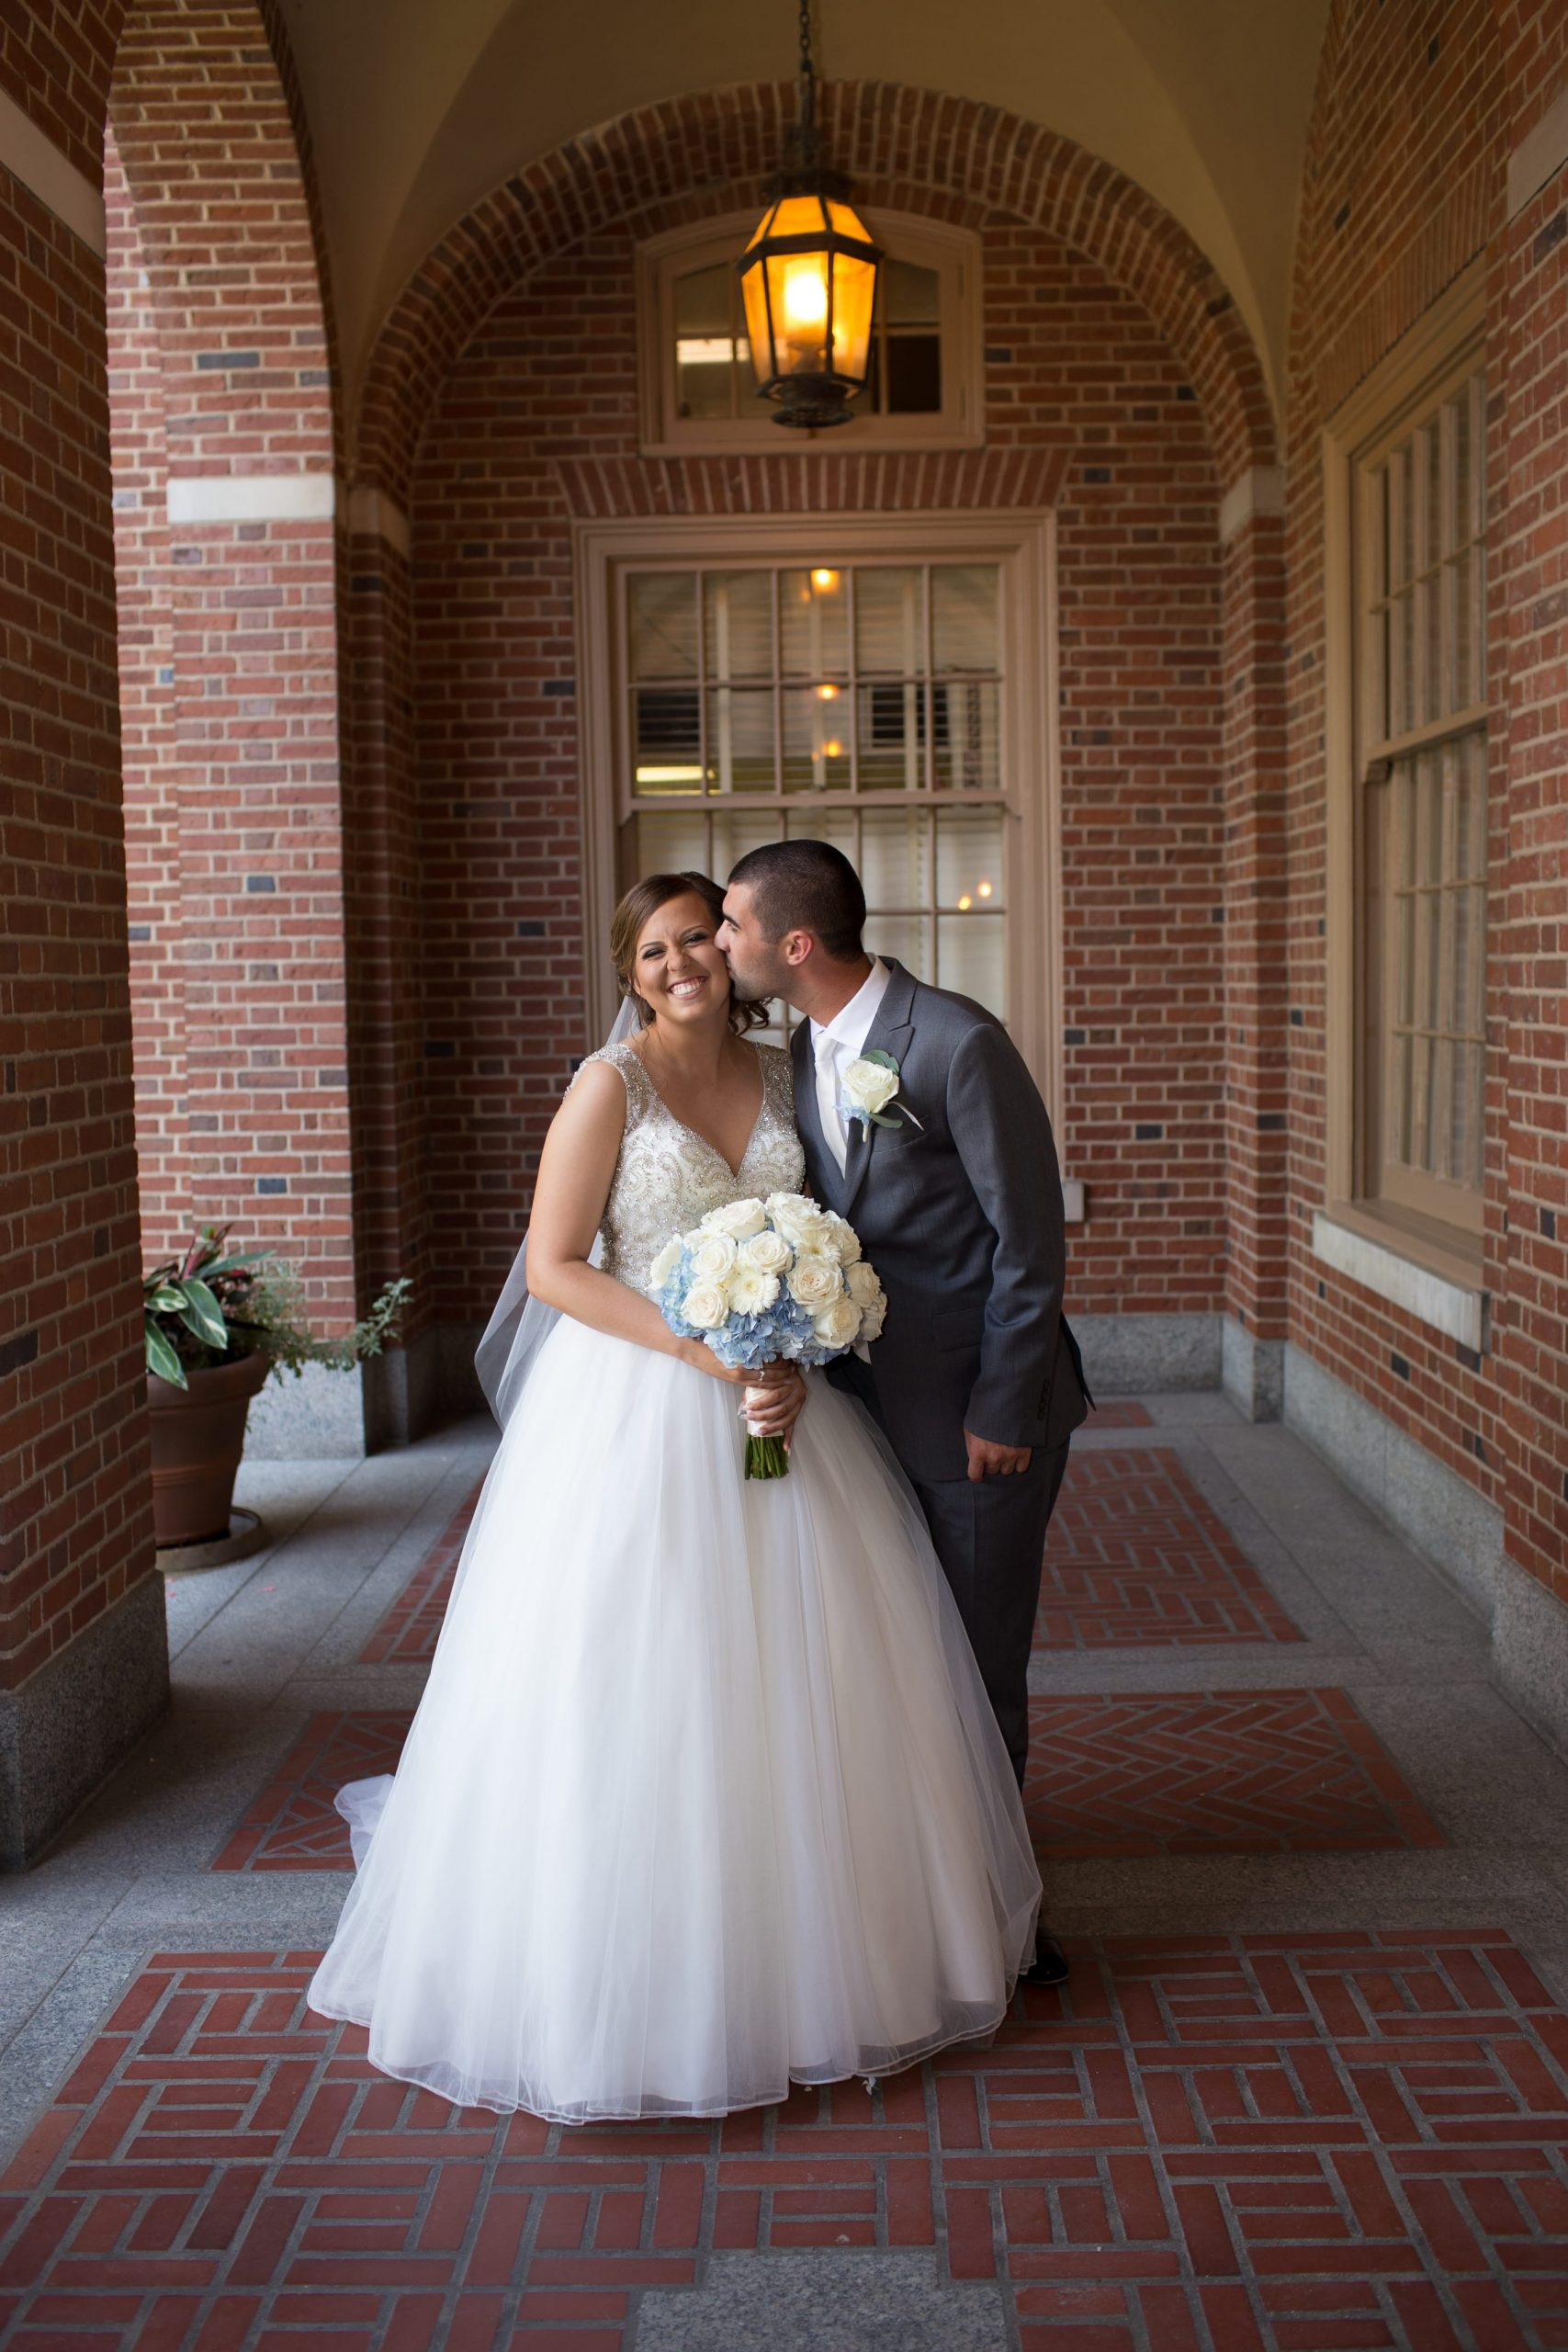 groom kissing bride on cheek under brick archway